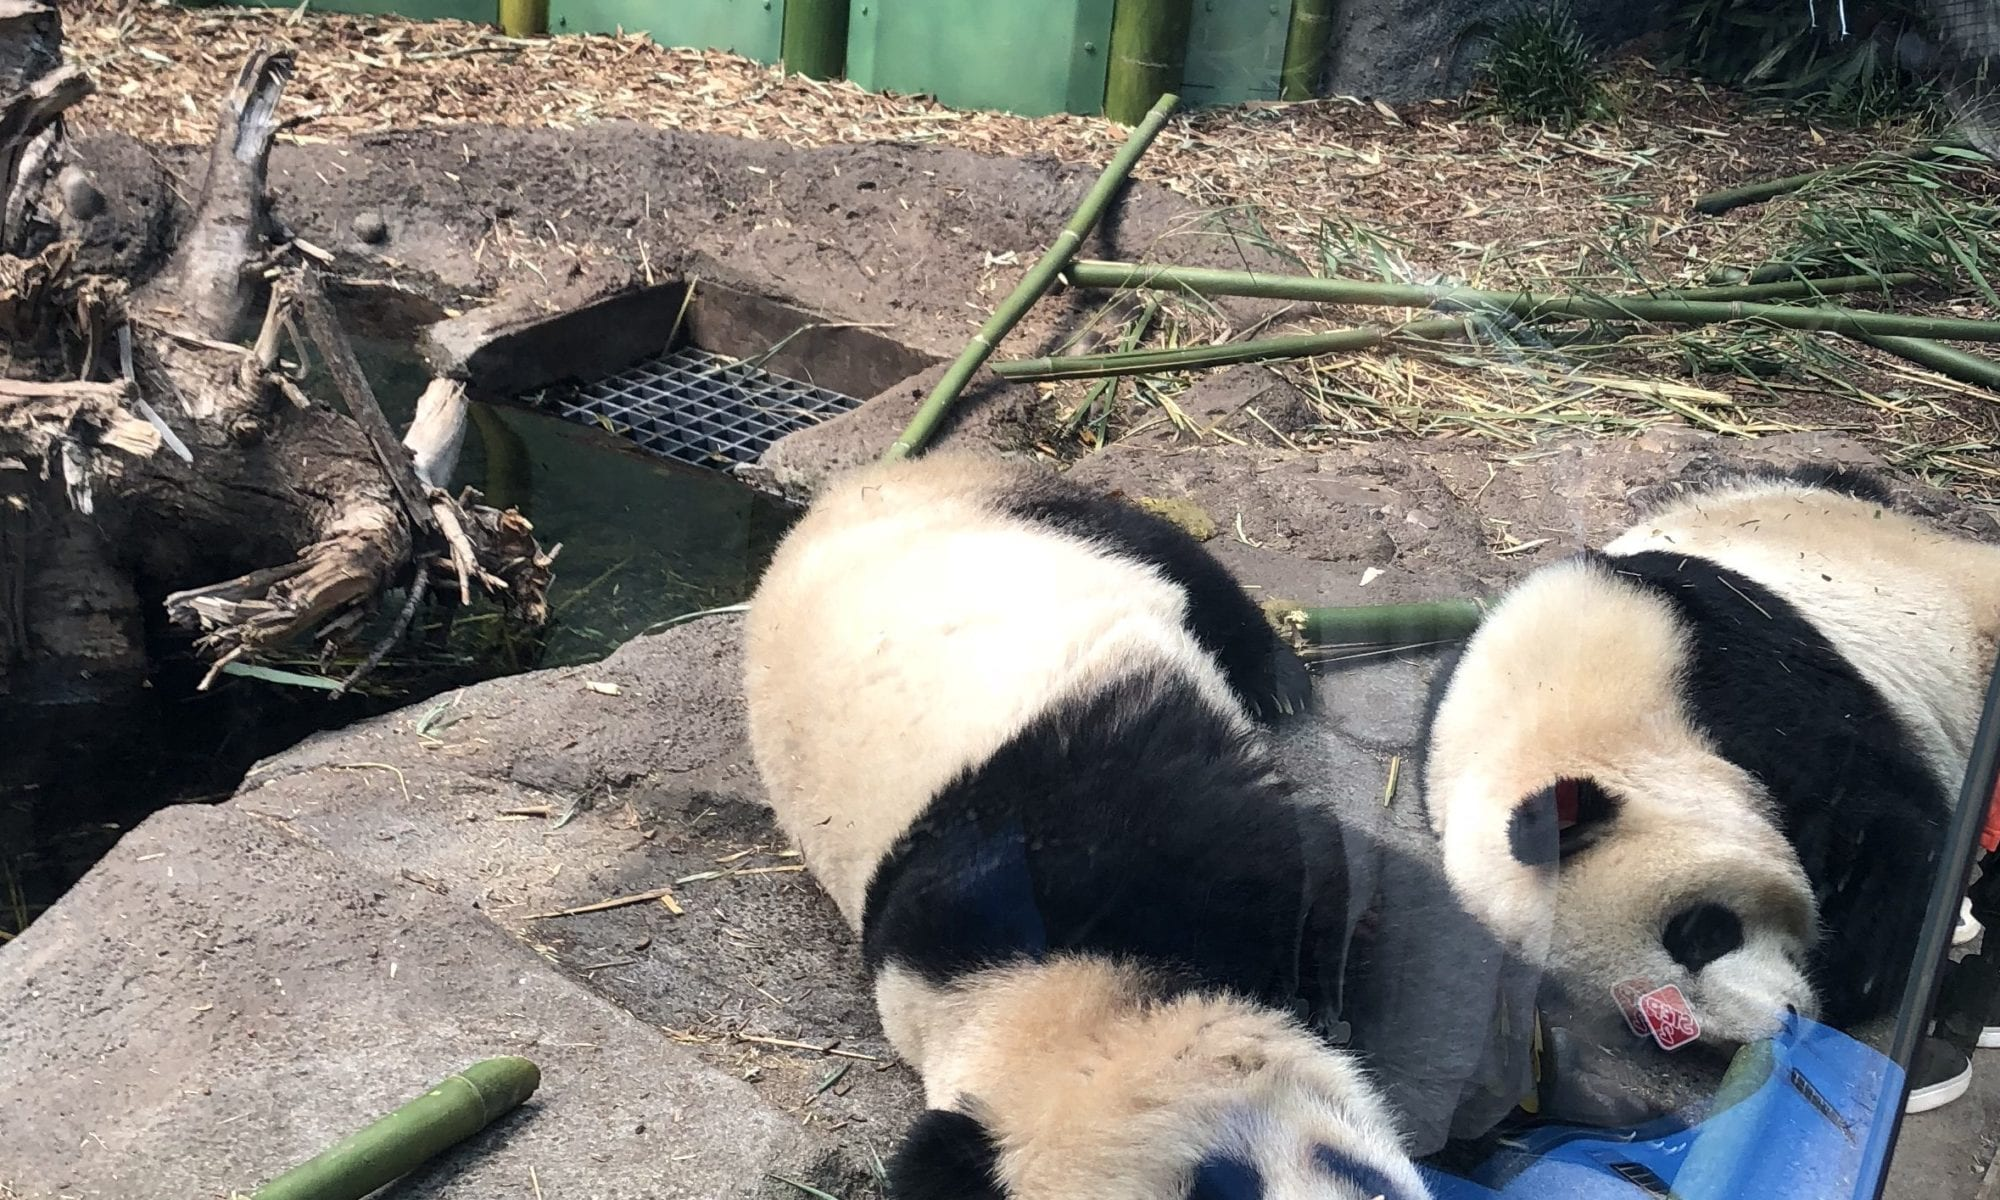 pandas at calgary zoo